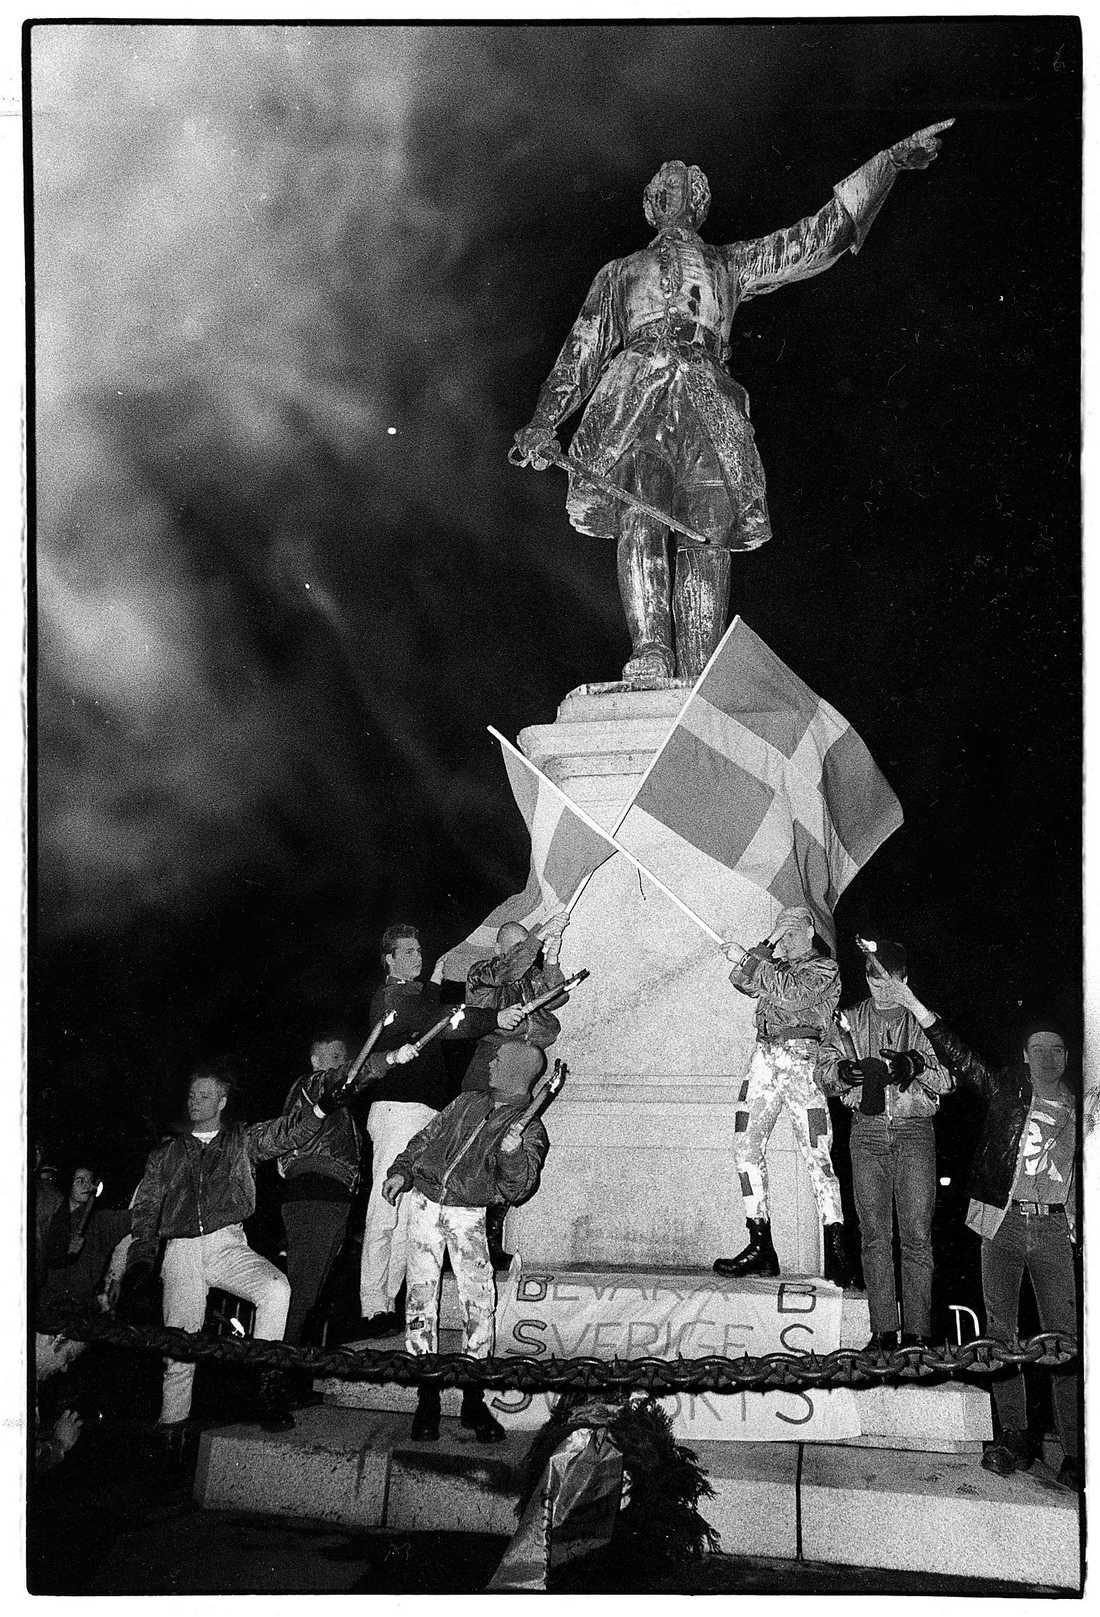 Bevara Sverige Svensk-aktivister vid Karl XII:s staty i Stockholm i november 1984.